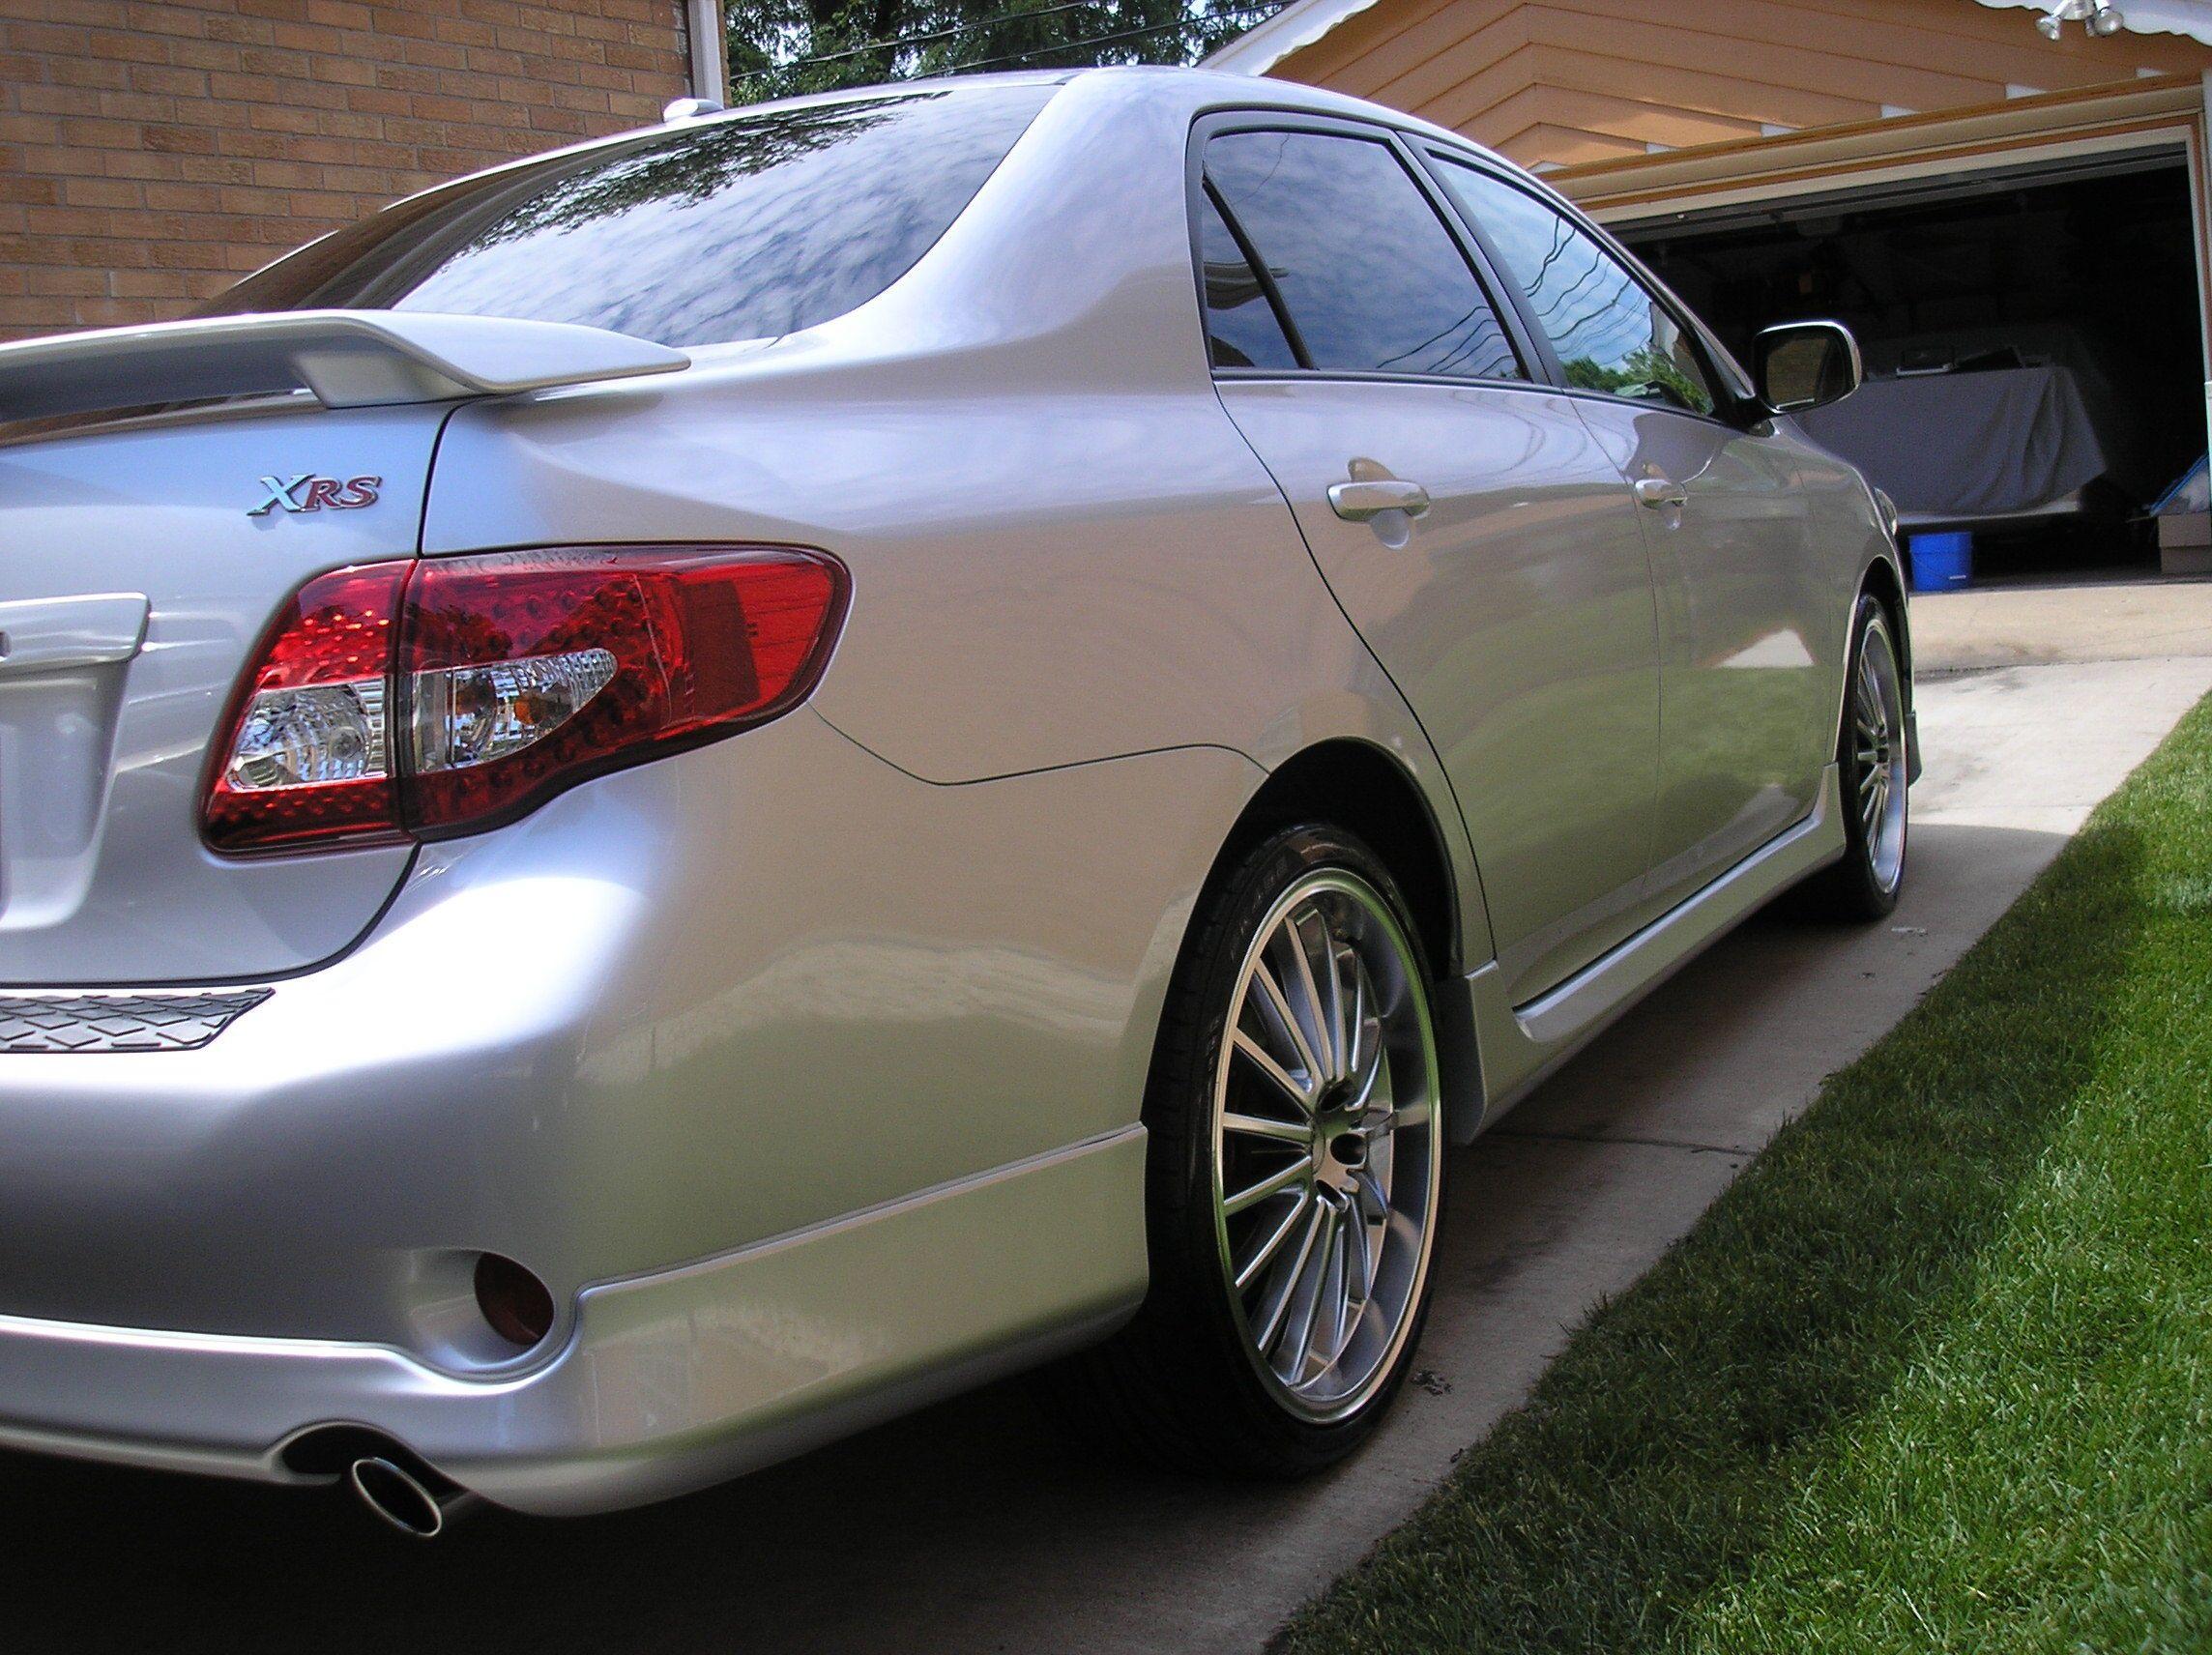 Pooky50 2009 Toyota Corolla33417220032 Original Sedan Toyota Toyota Corolla